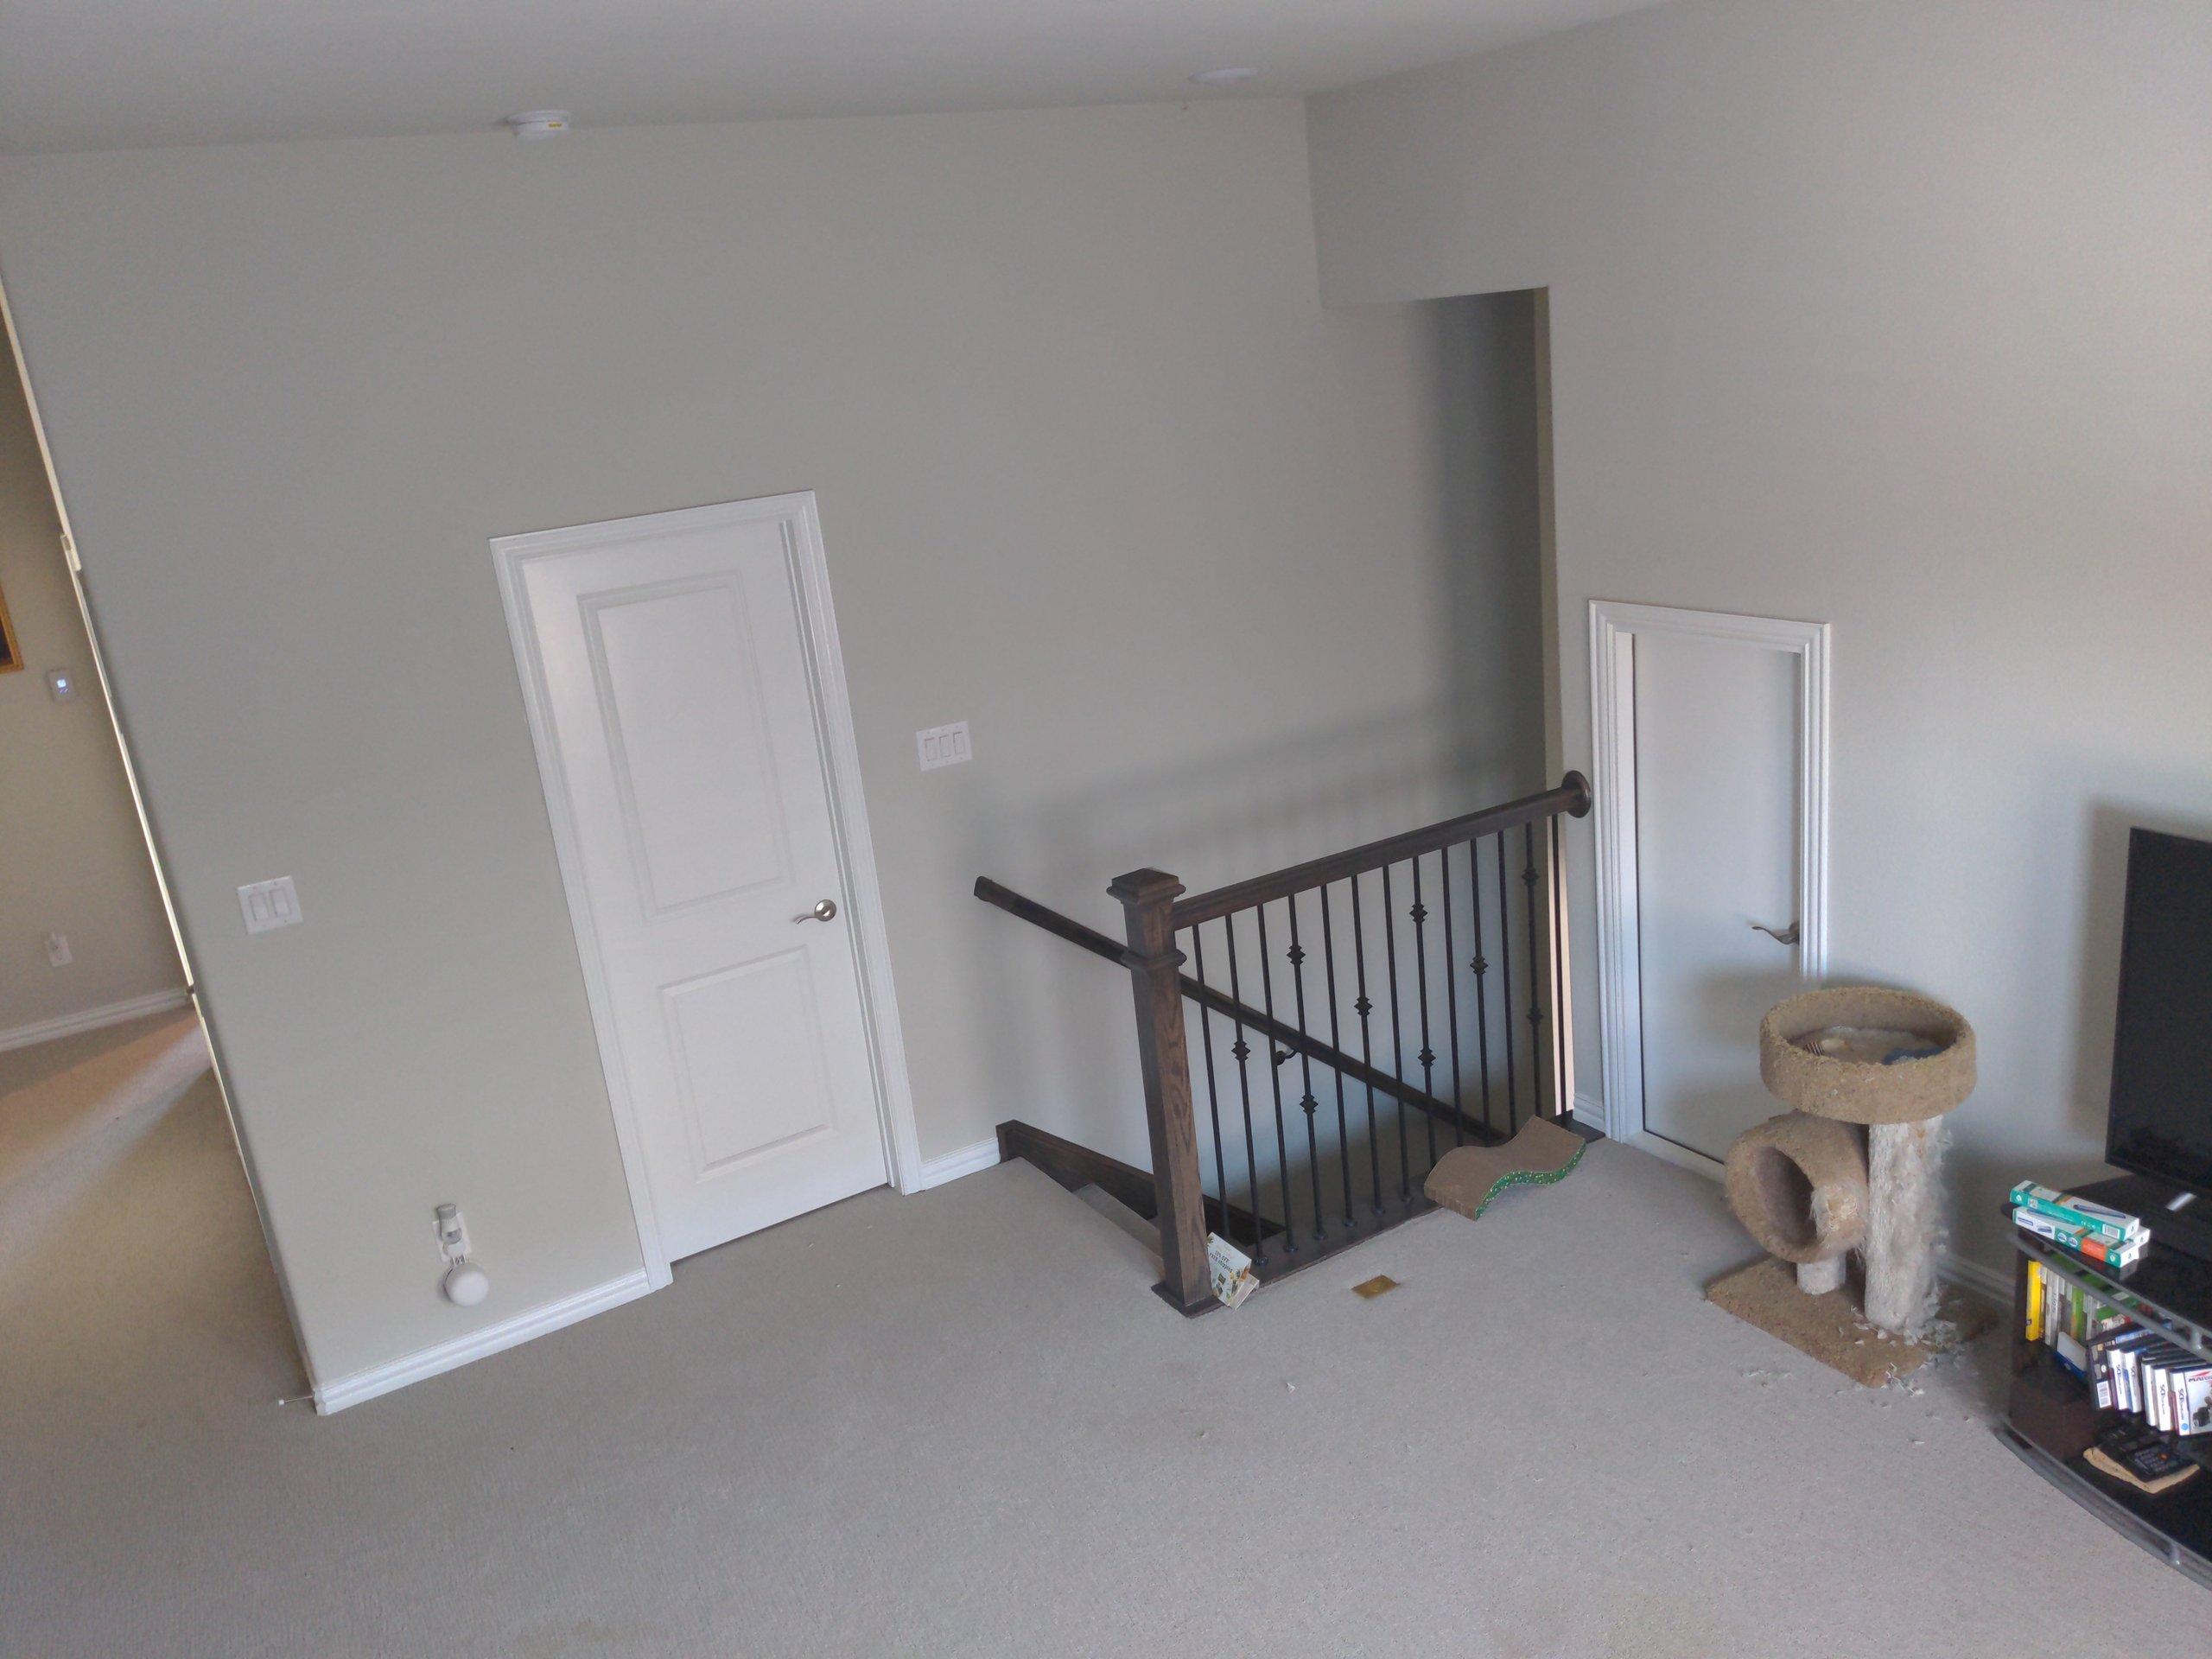 7x6 Bedroom self storage unit